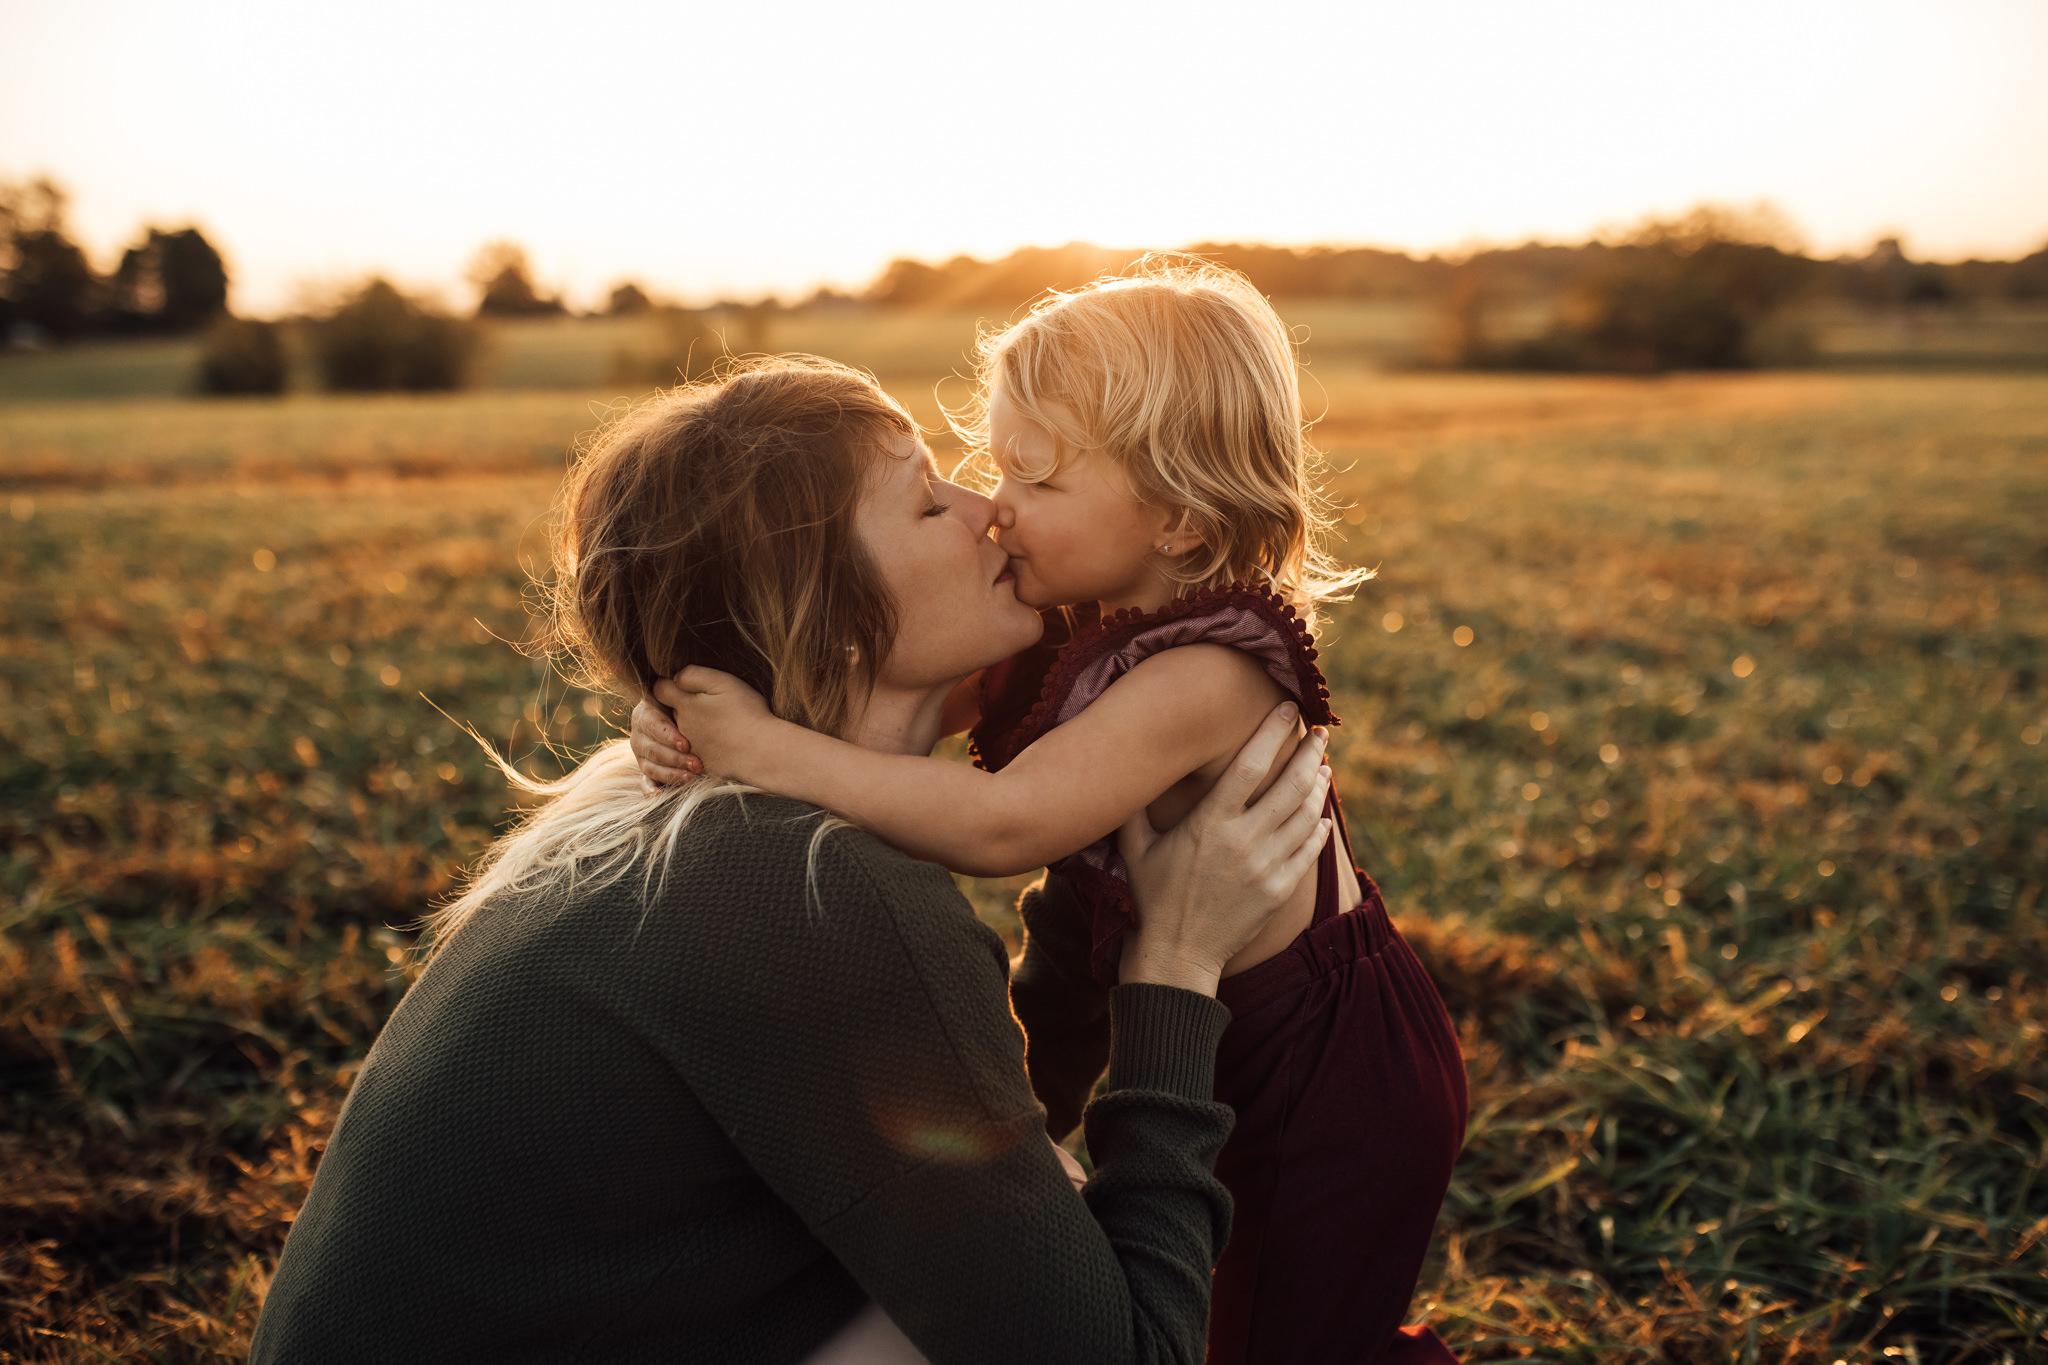 cassie-cook-photography-memphis-family-photographer-lifestyle-family-photographer-sunrise-gray-family-26.jpg